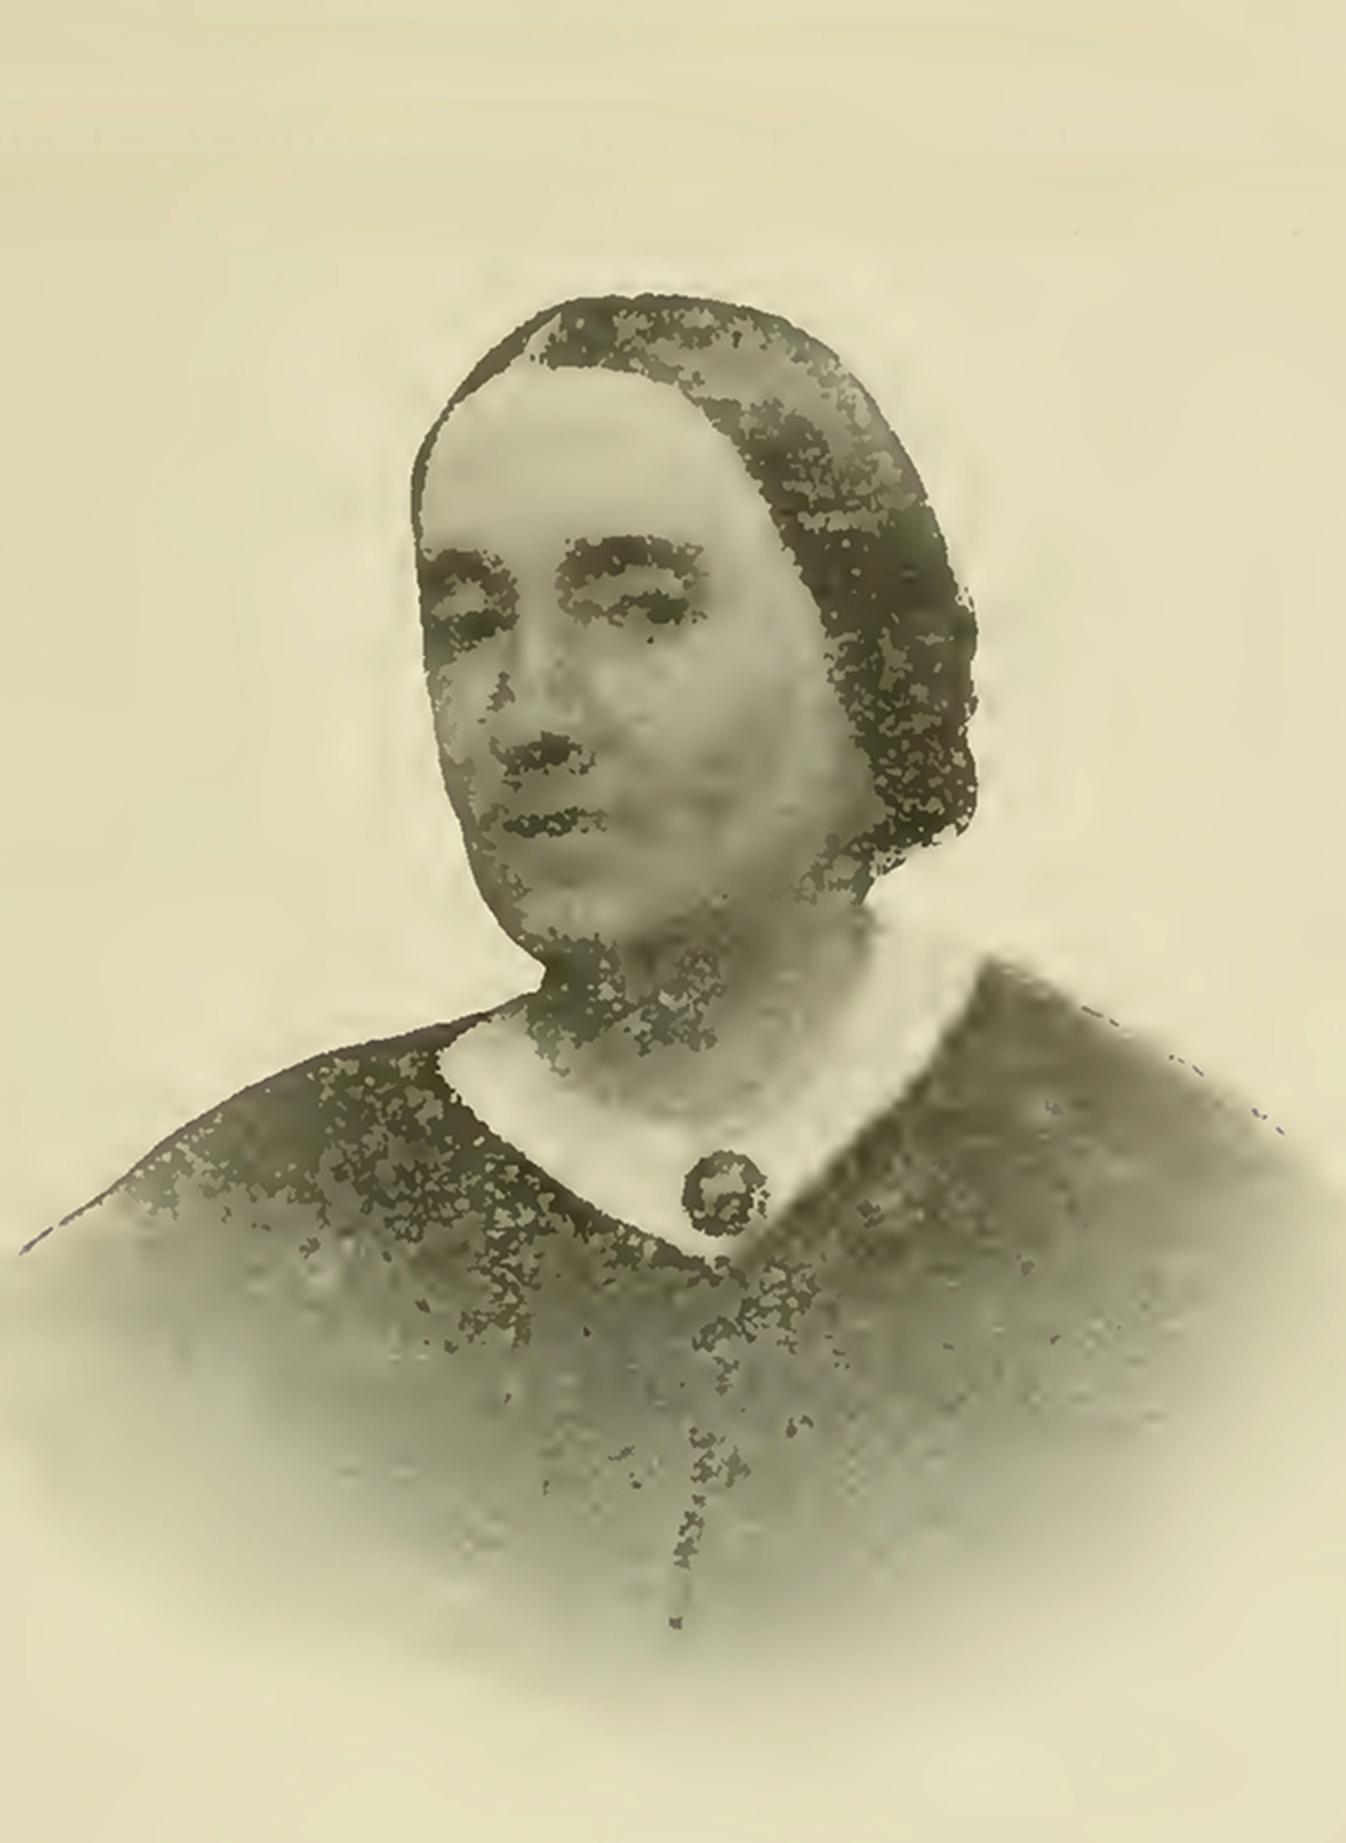 Catalina Benito Reoyo